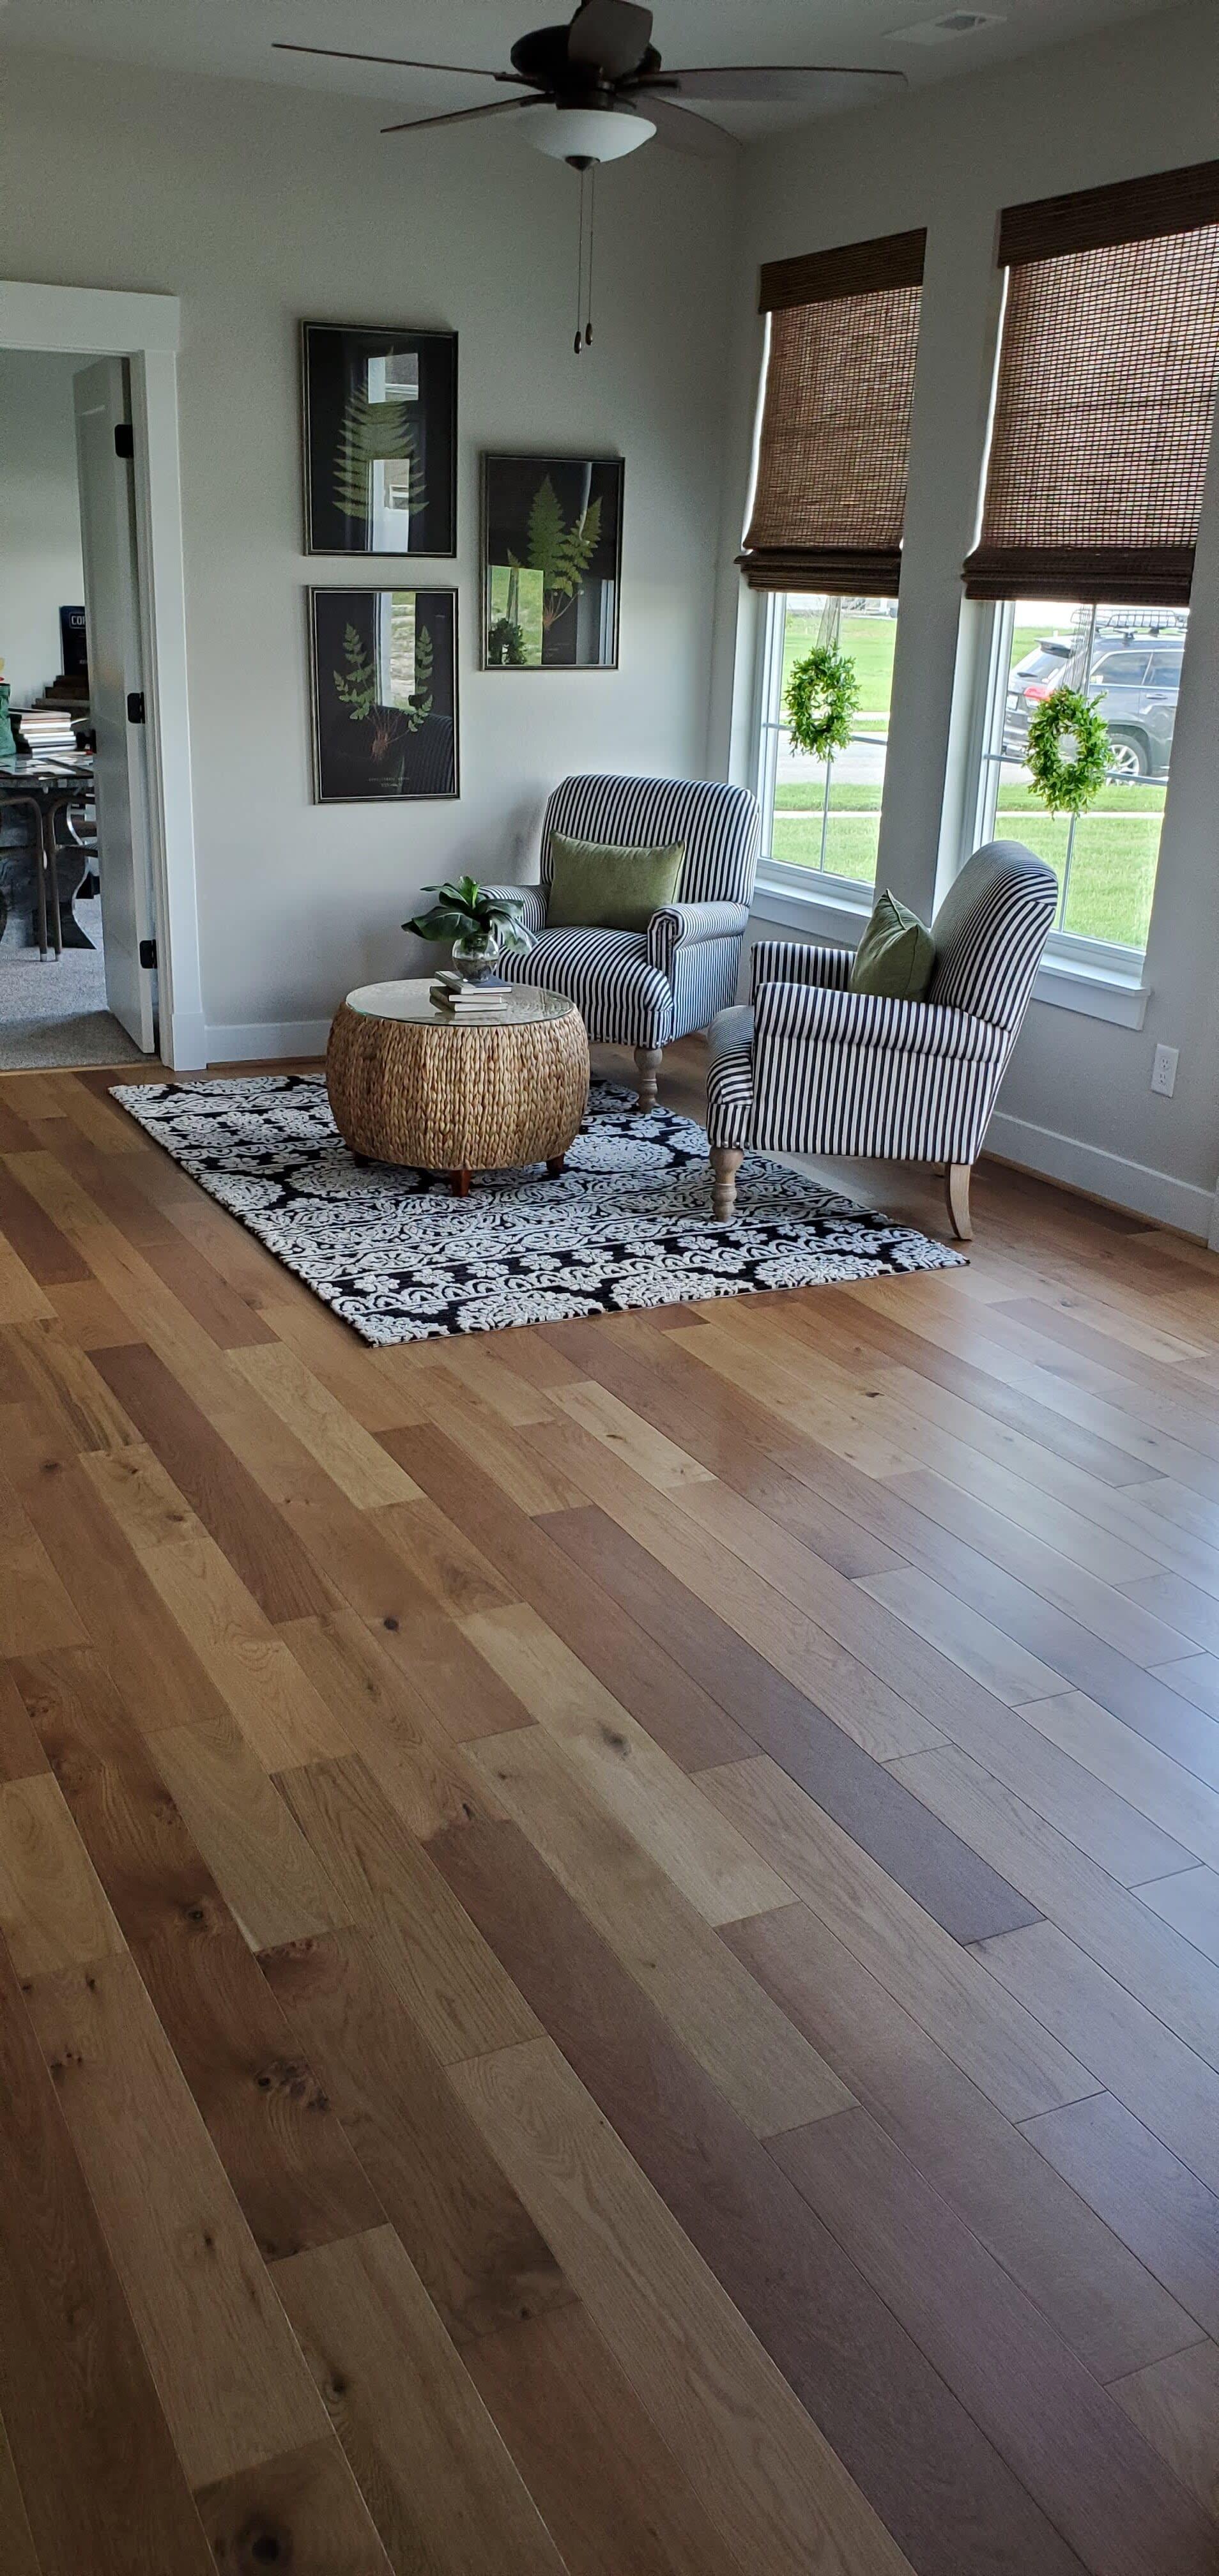 Durable hardwood in Norfolk, VA from Floors Unlimited